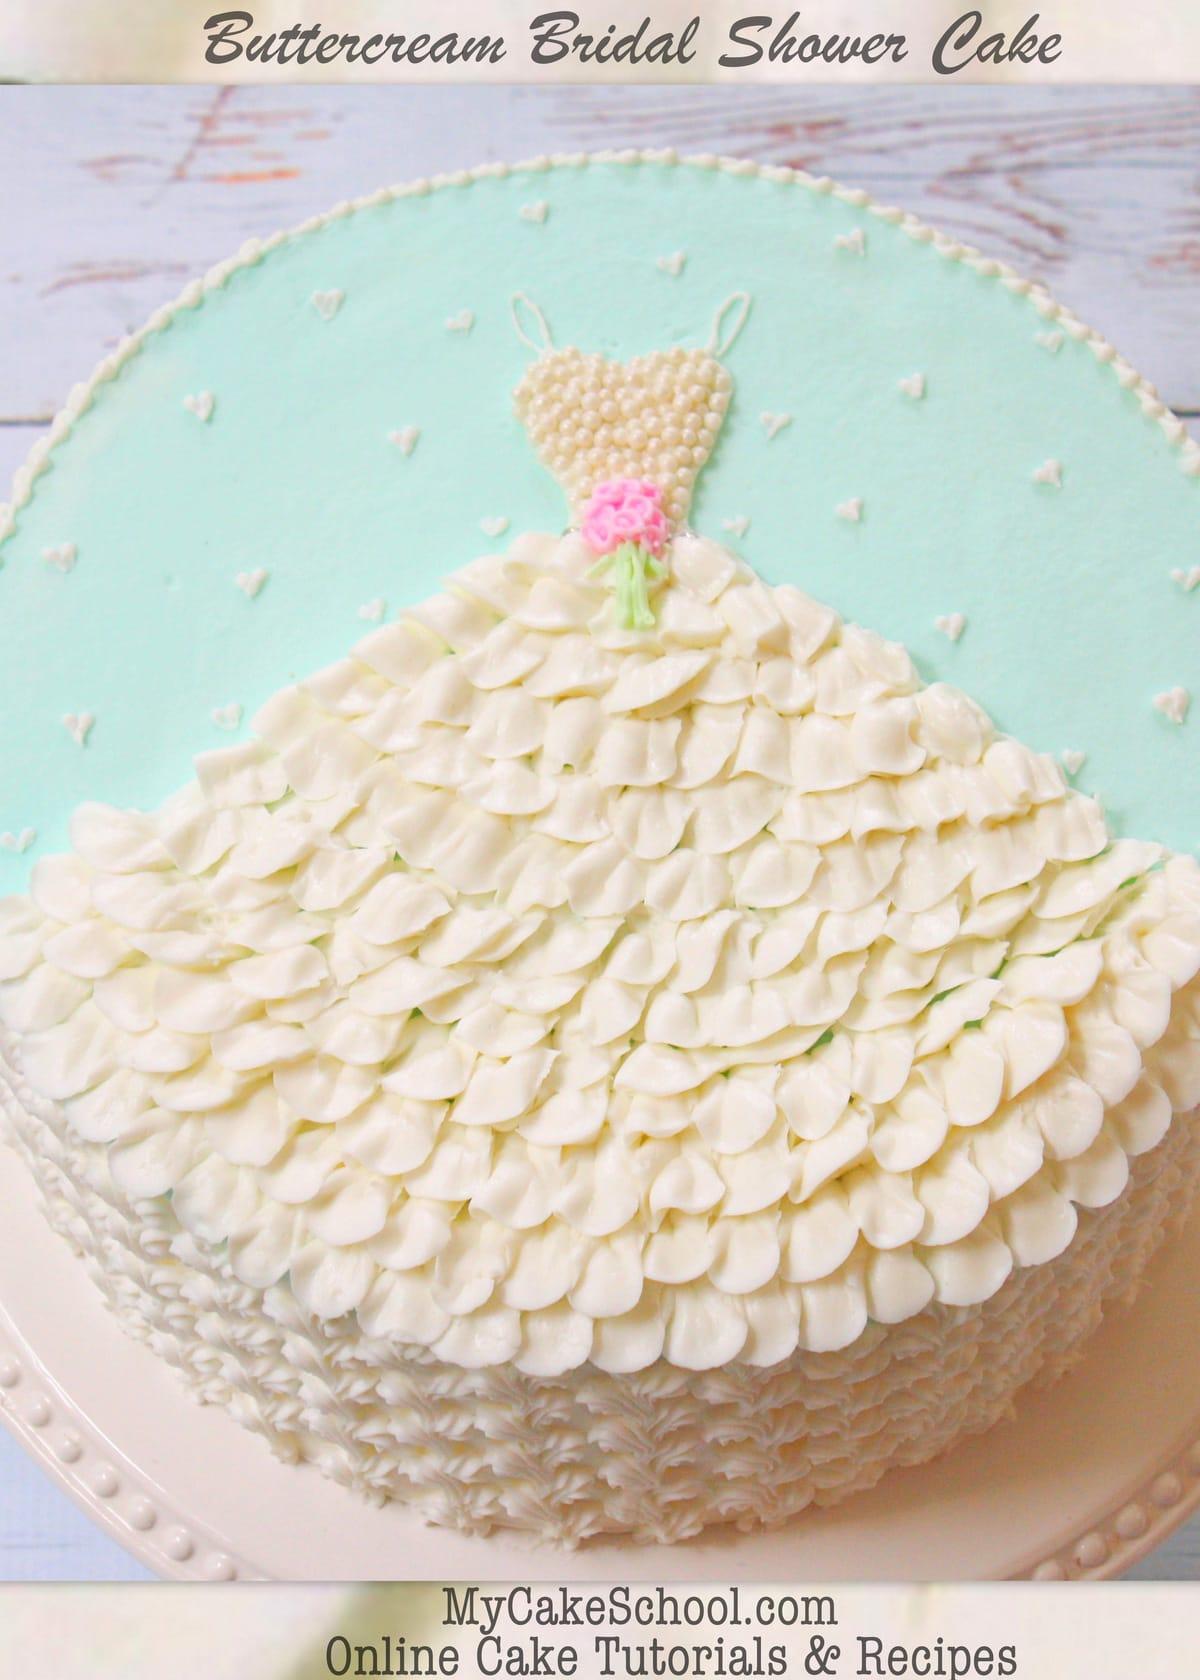 Simple Wedding Cake Design Buttercream : Wedding Dress in Buttercream- A Free Cake Decorating ...